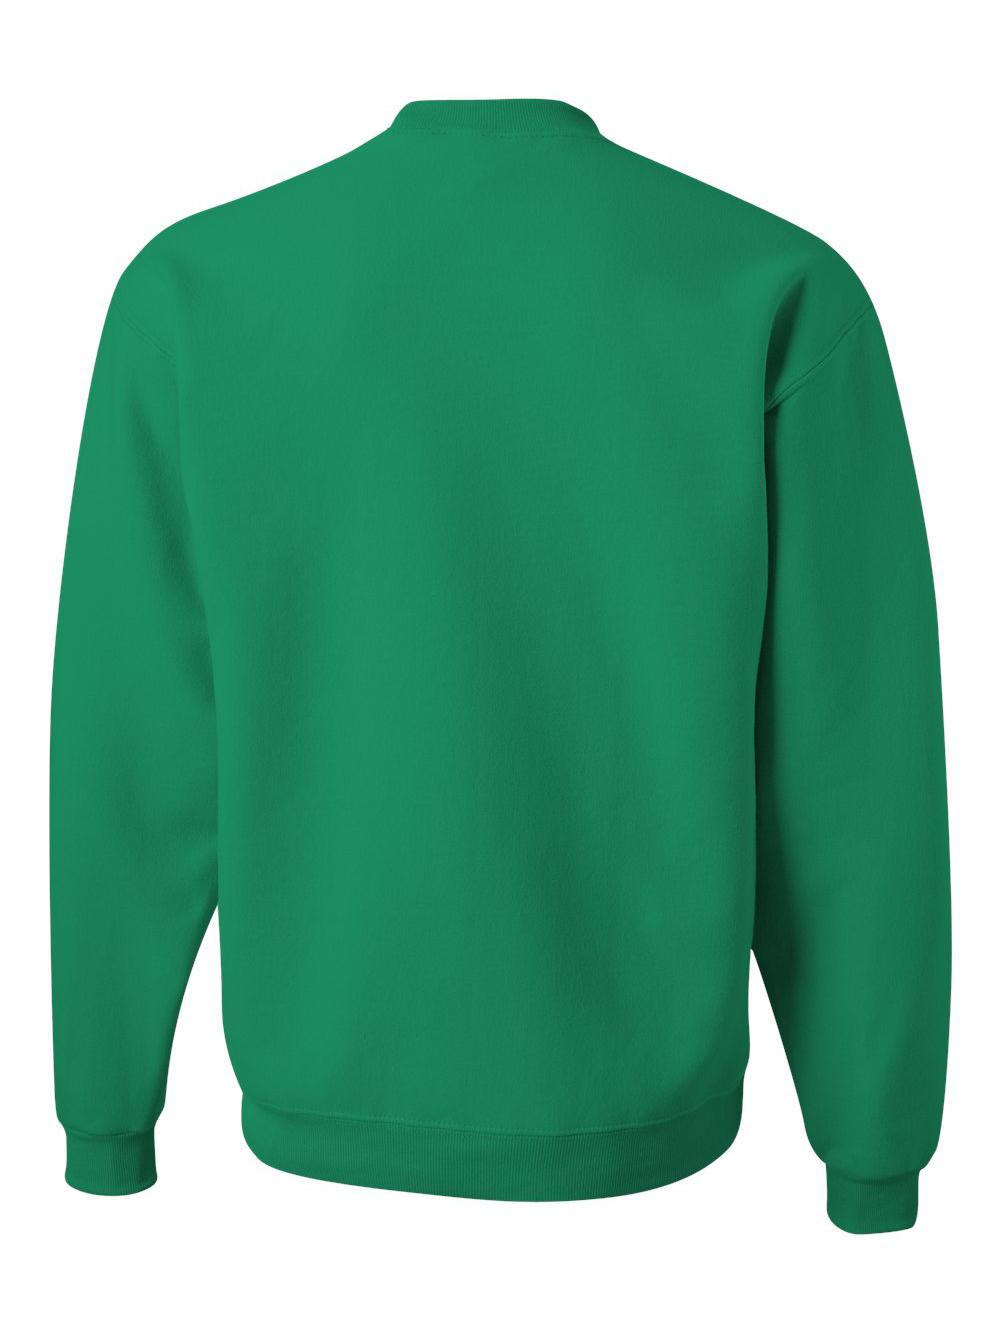 Jerzees-NuBlend-Crewneck-Sweatshirt-562MR thumbnail 49